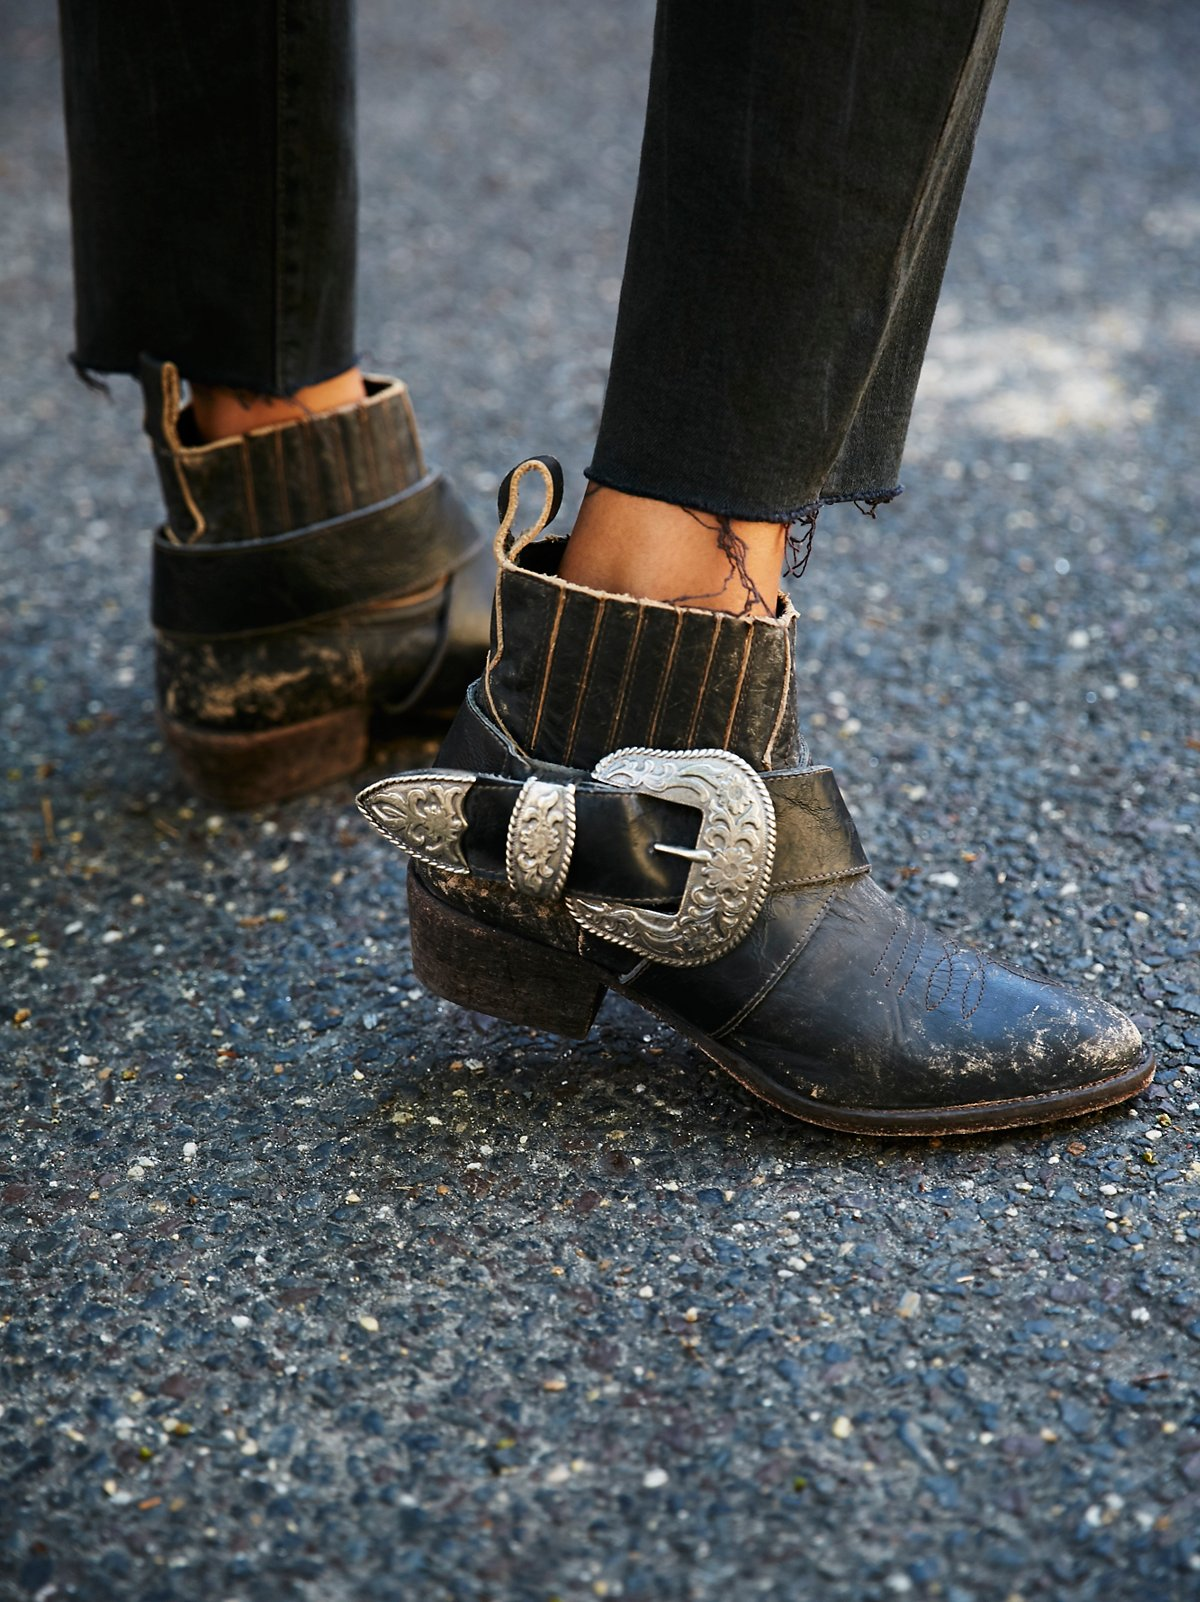 Understated机车靴